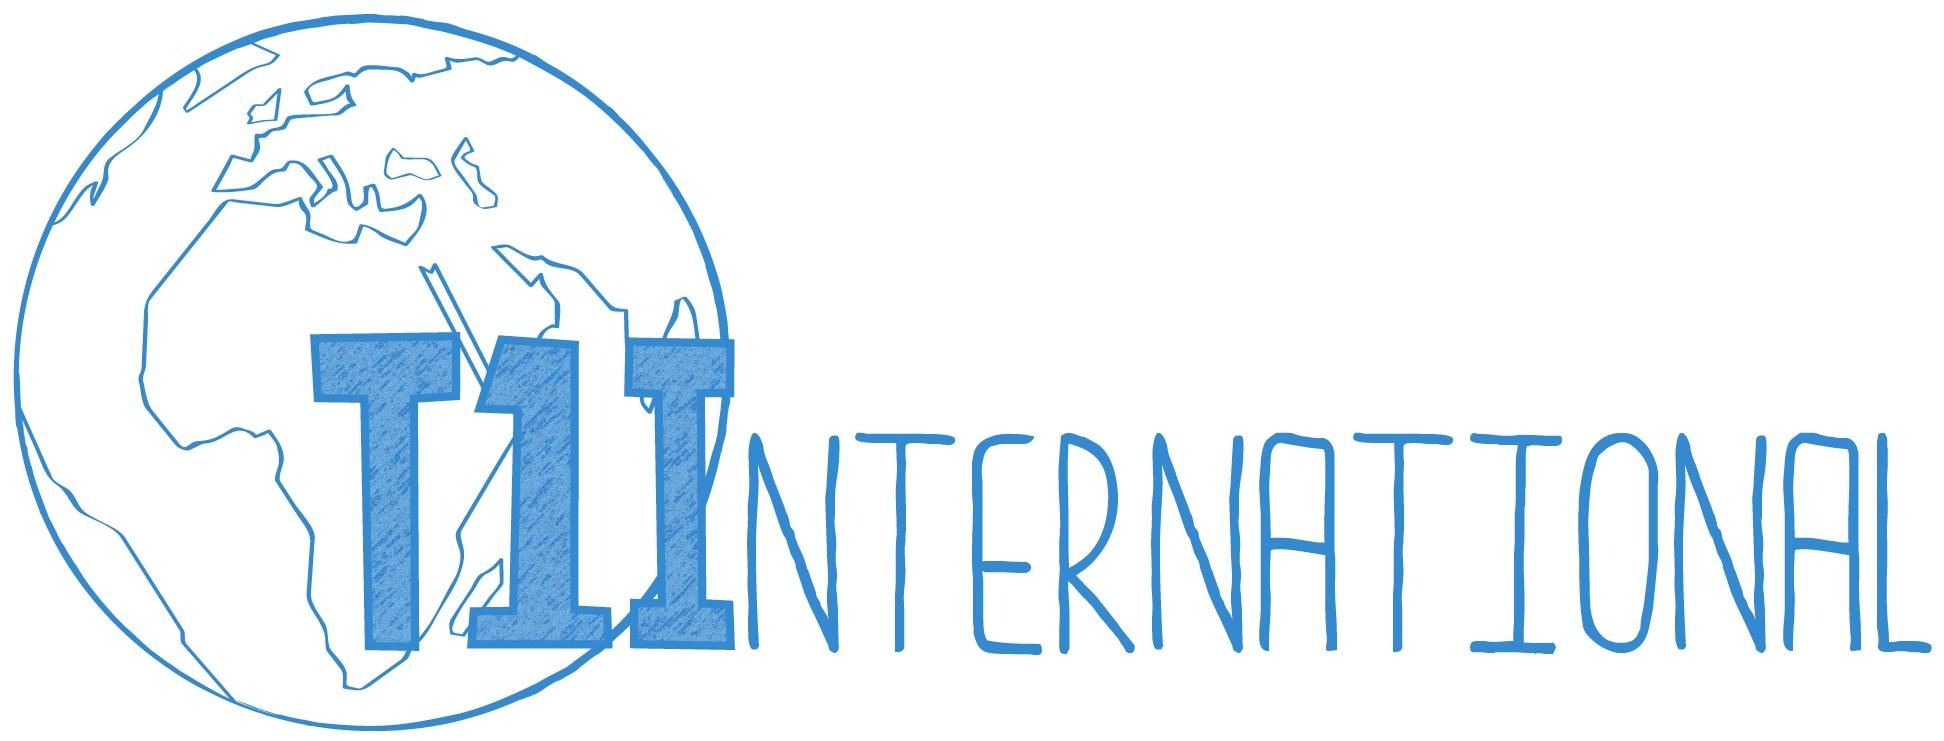 T1 International Logo